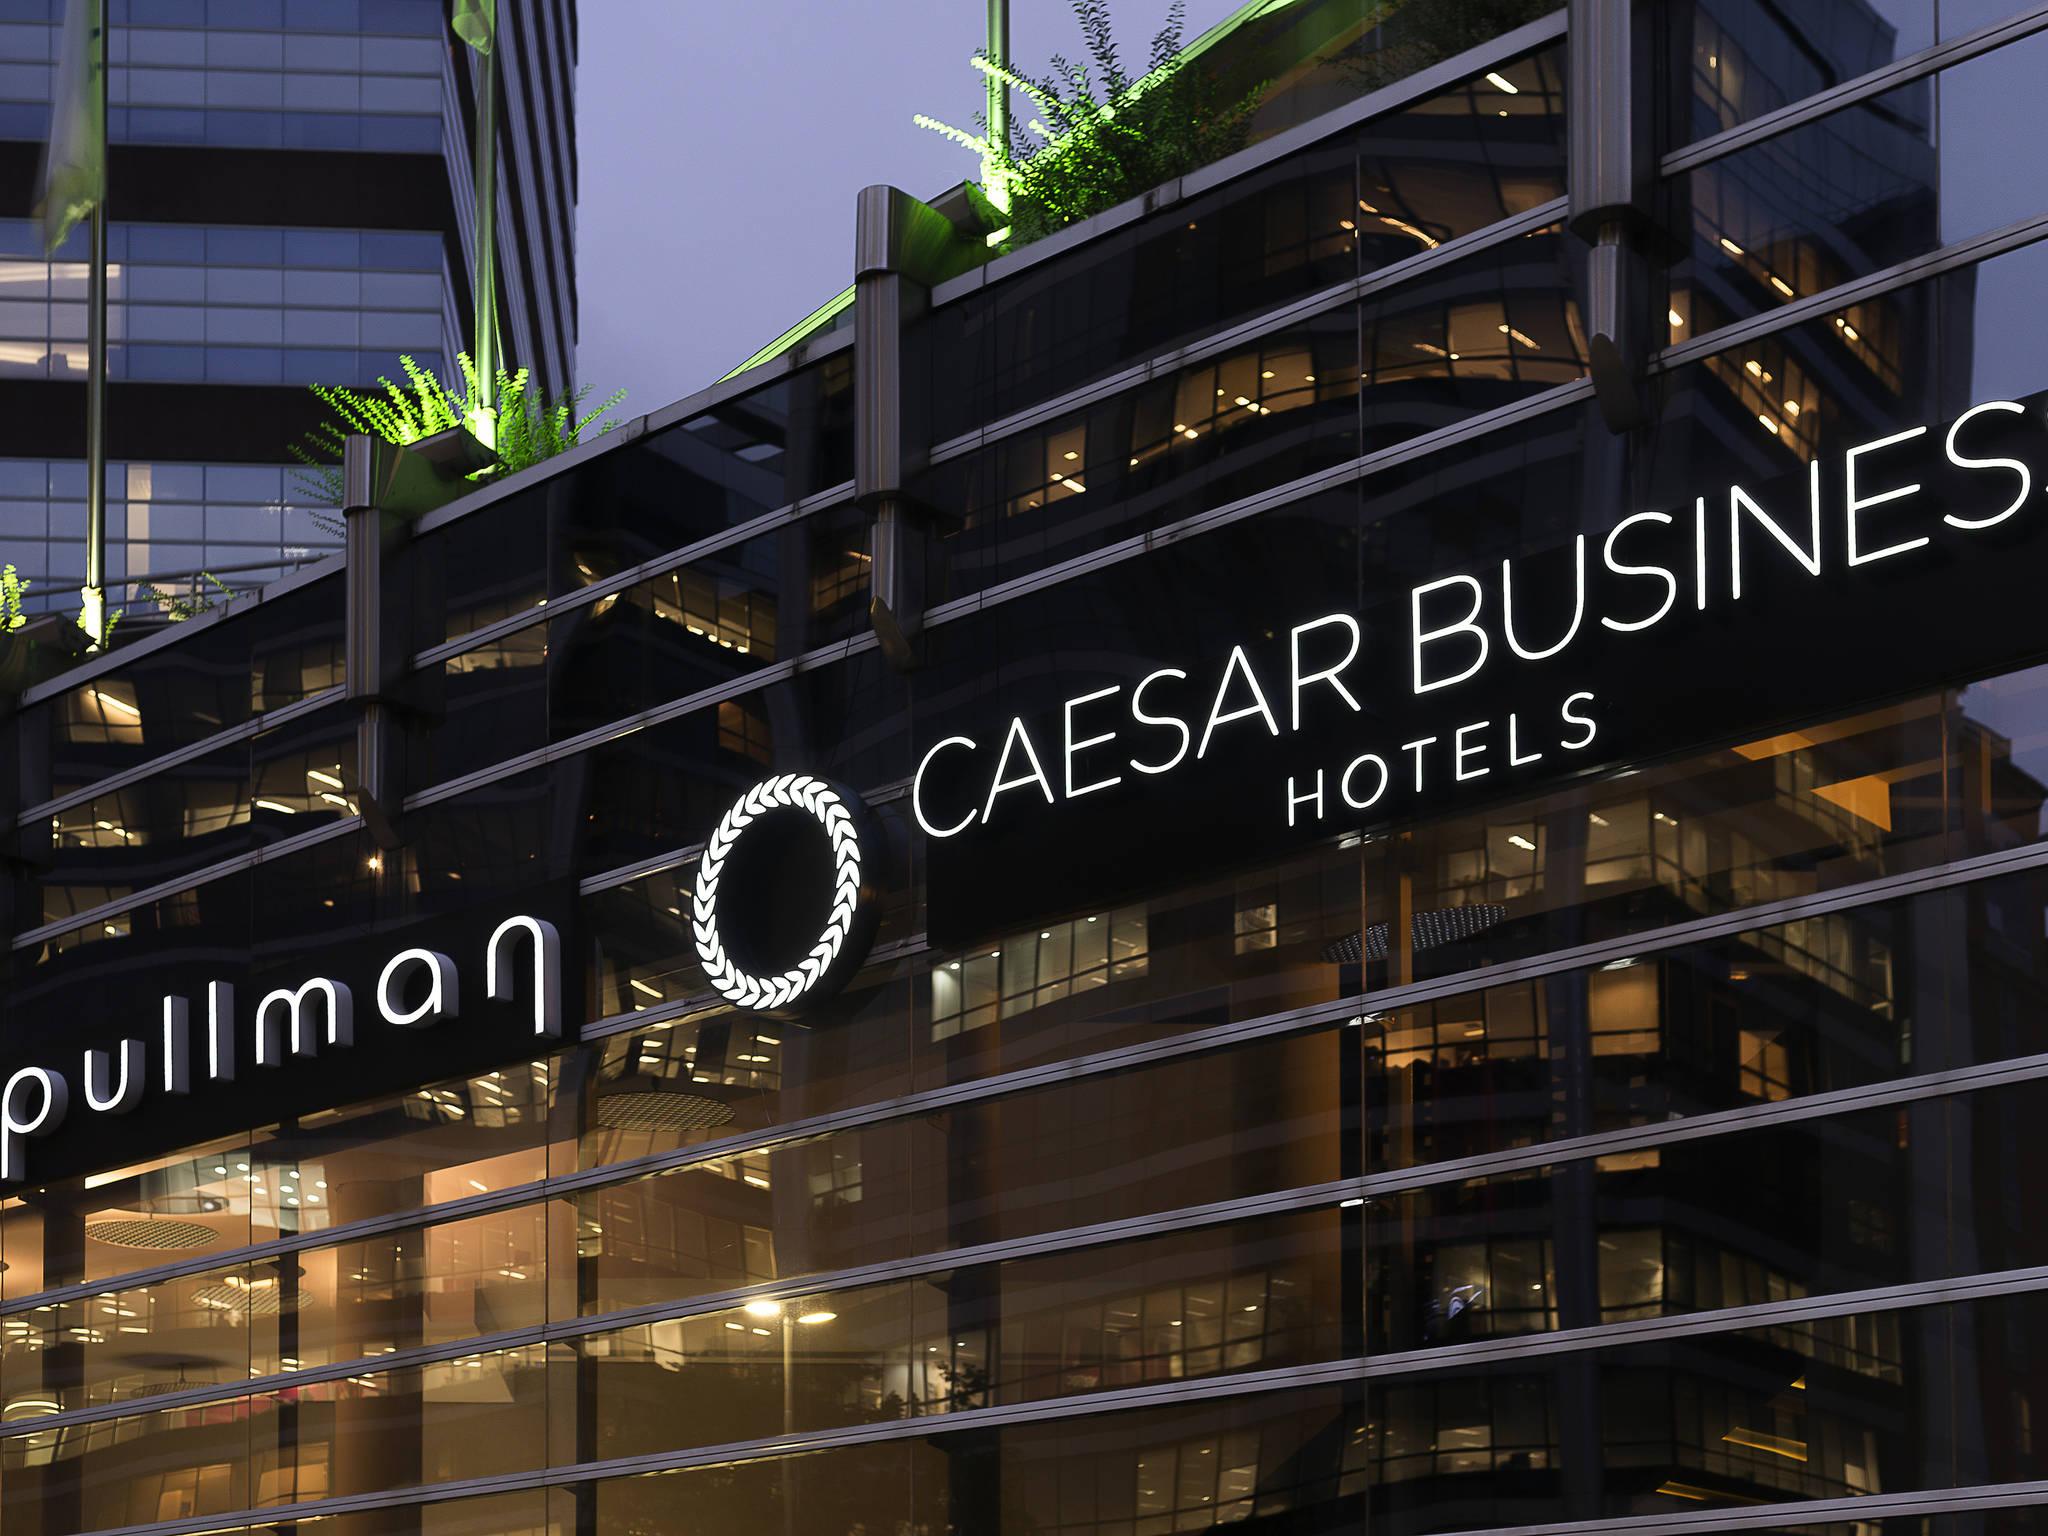 CEASAR BUSINESS PARK